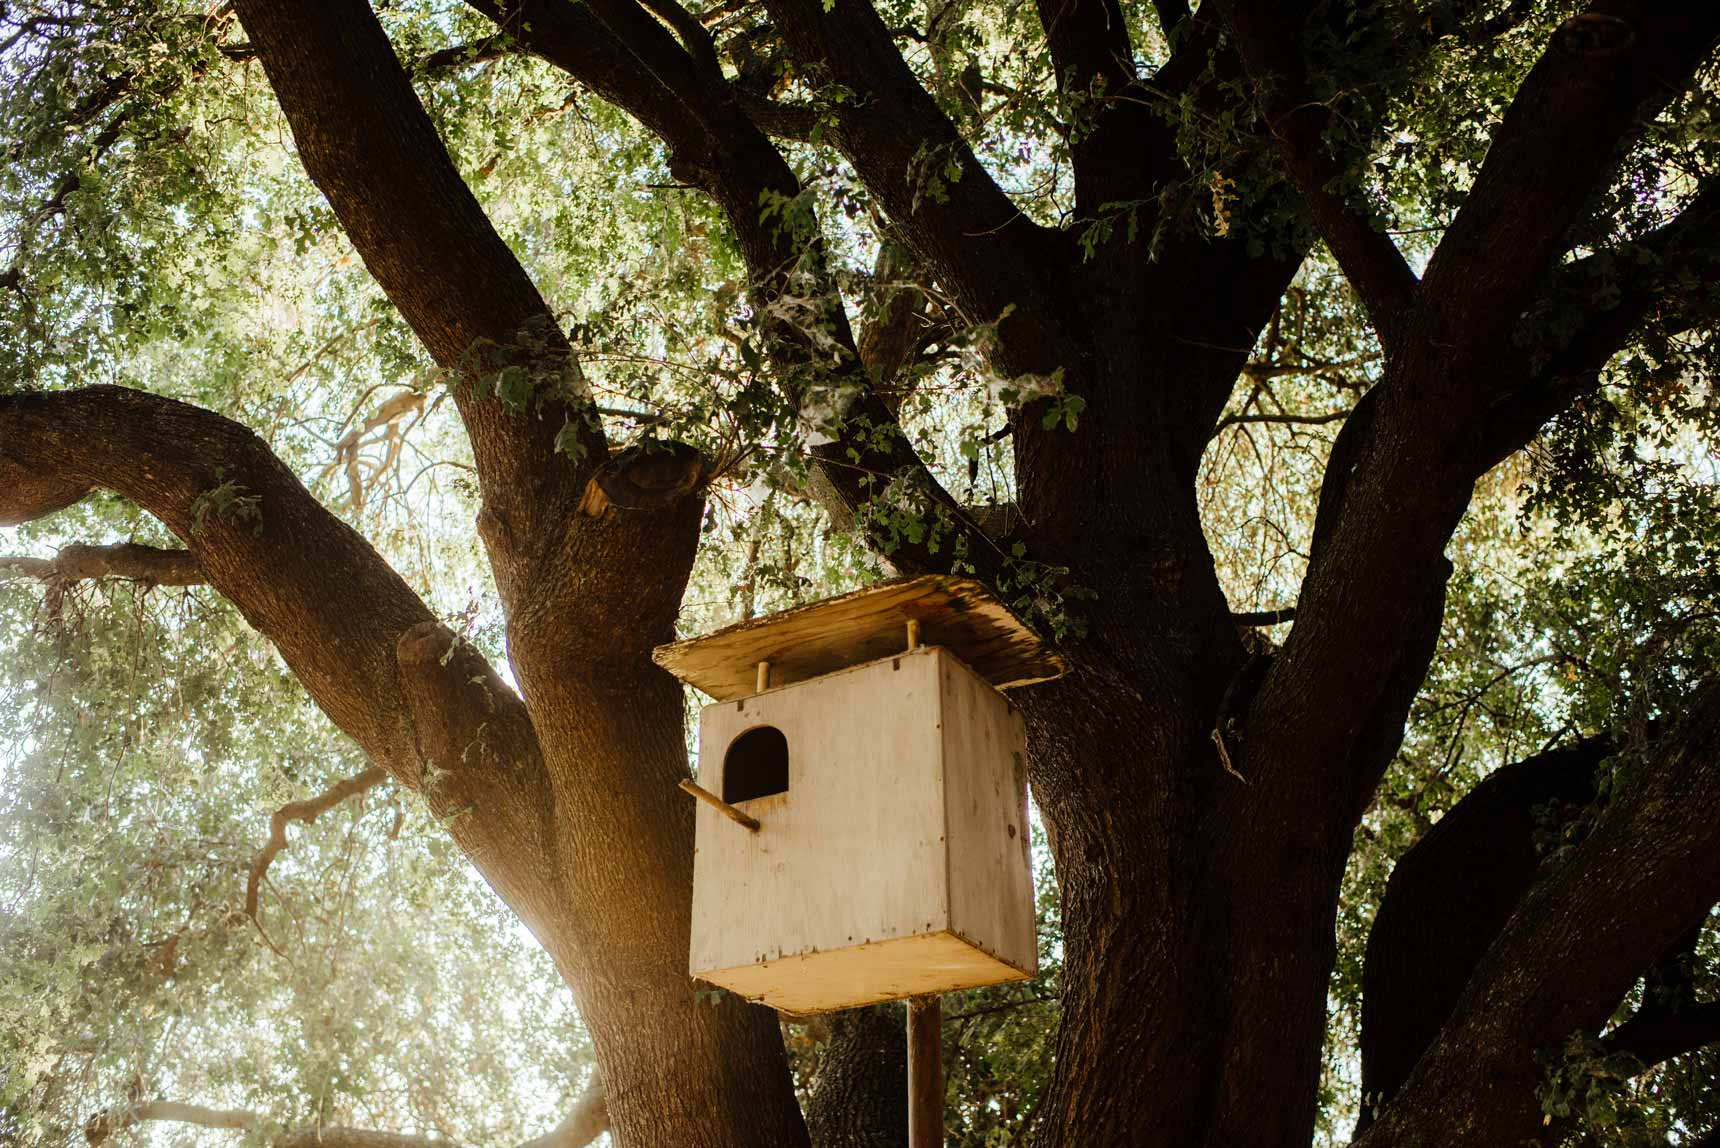 A birdhouse at sandpoint